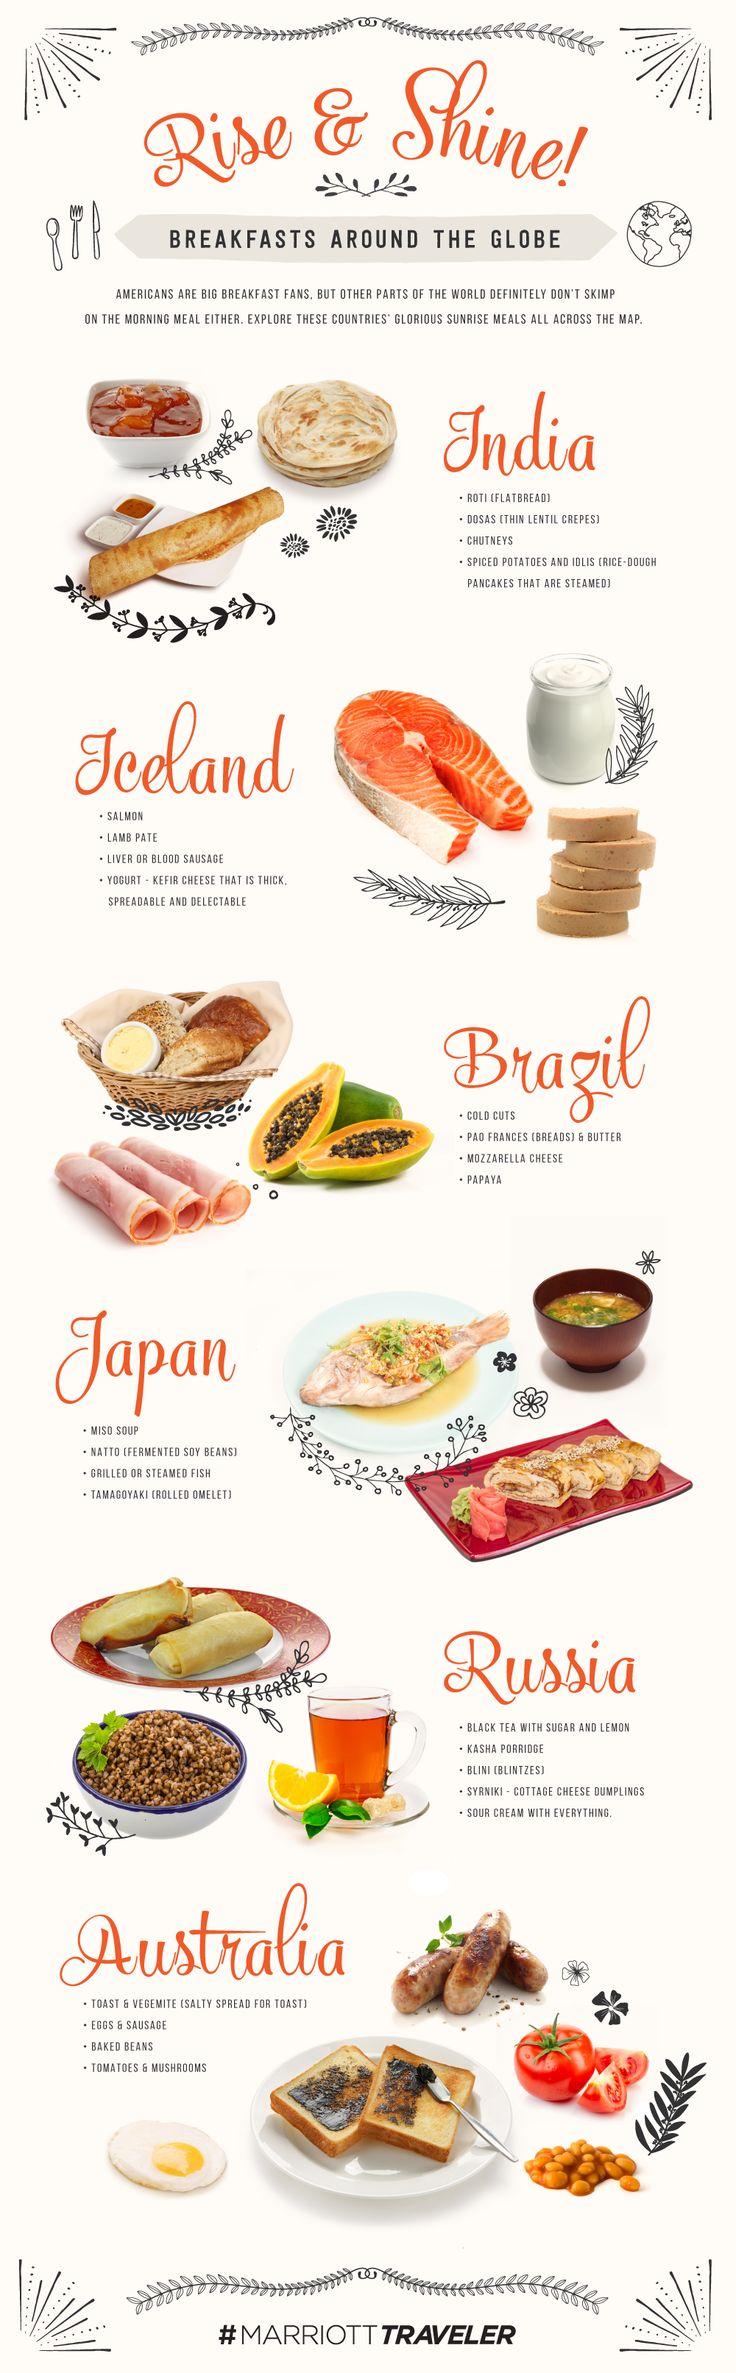 Nz fish species tea towel 12 00 the seafood new zealand tea towel - Best Breakfast Food Around The World